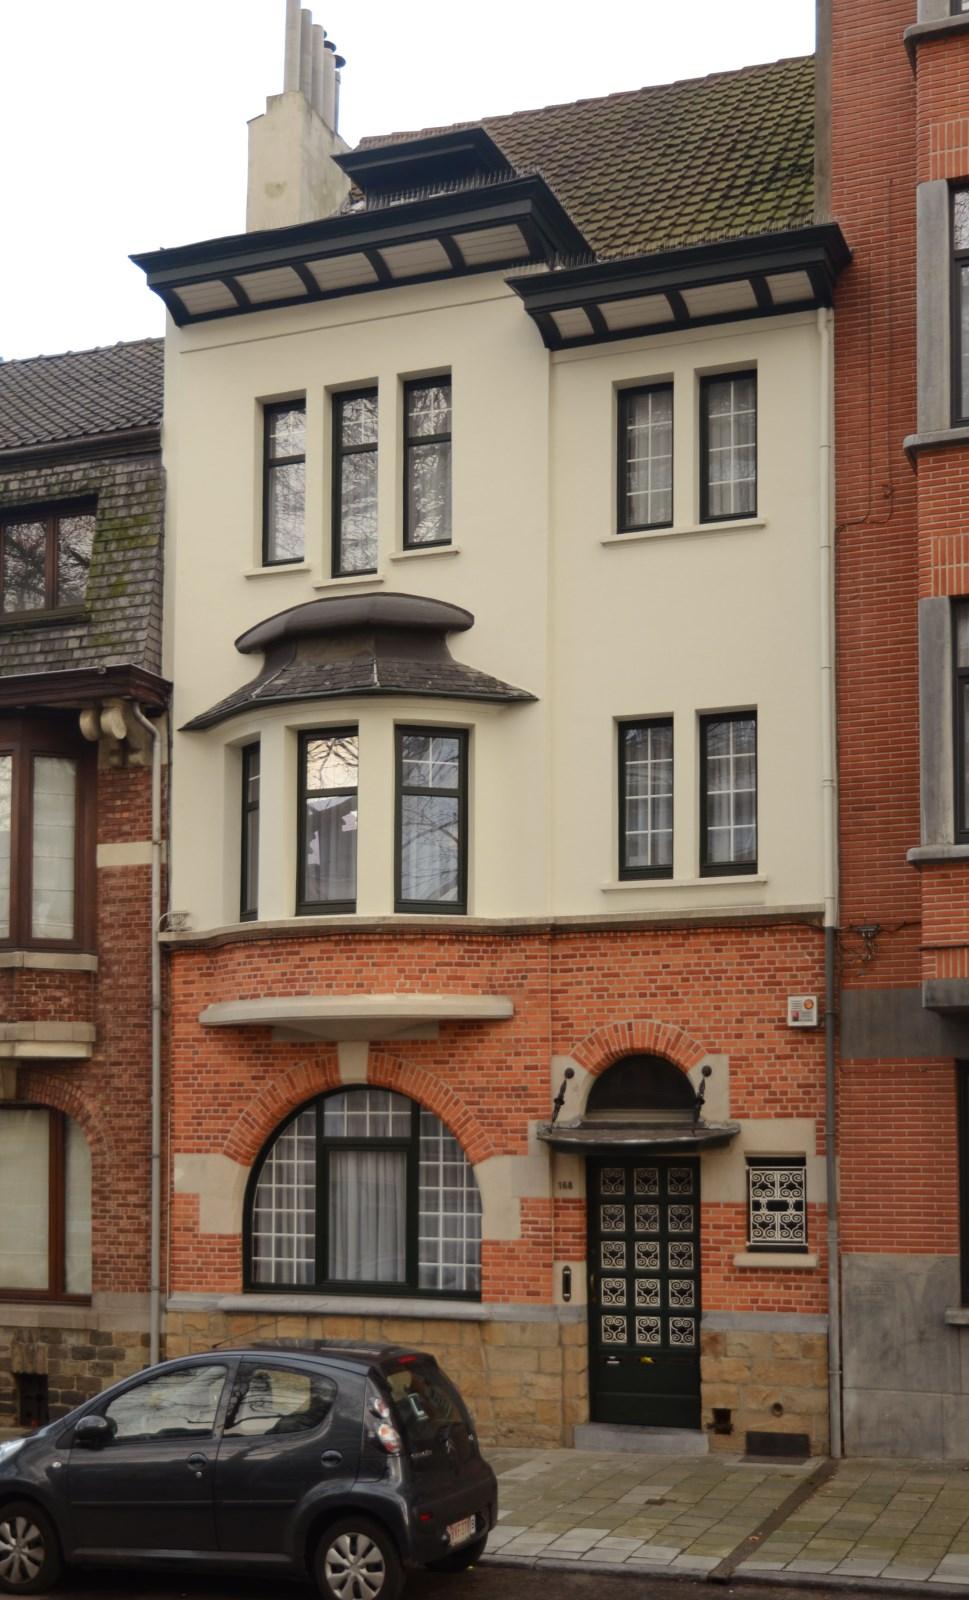 Avenue Voltaire 168, 2013